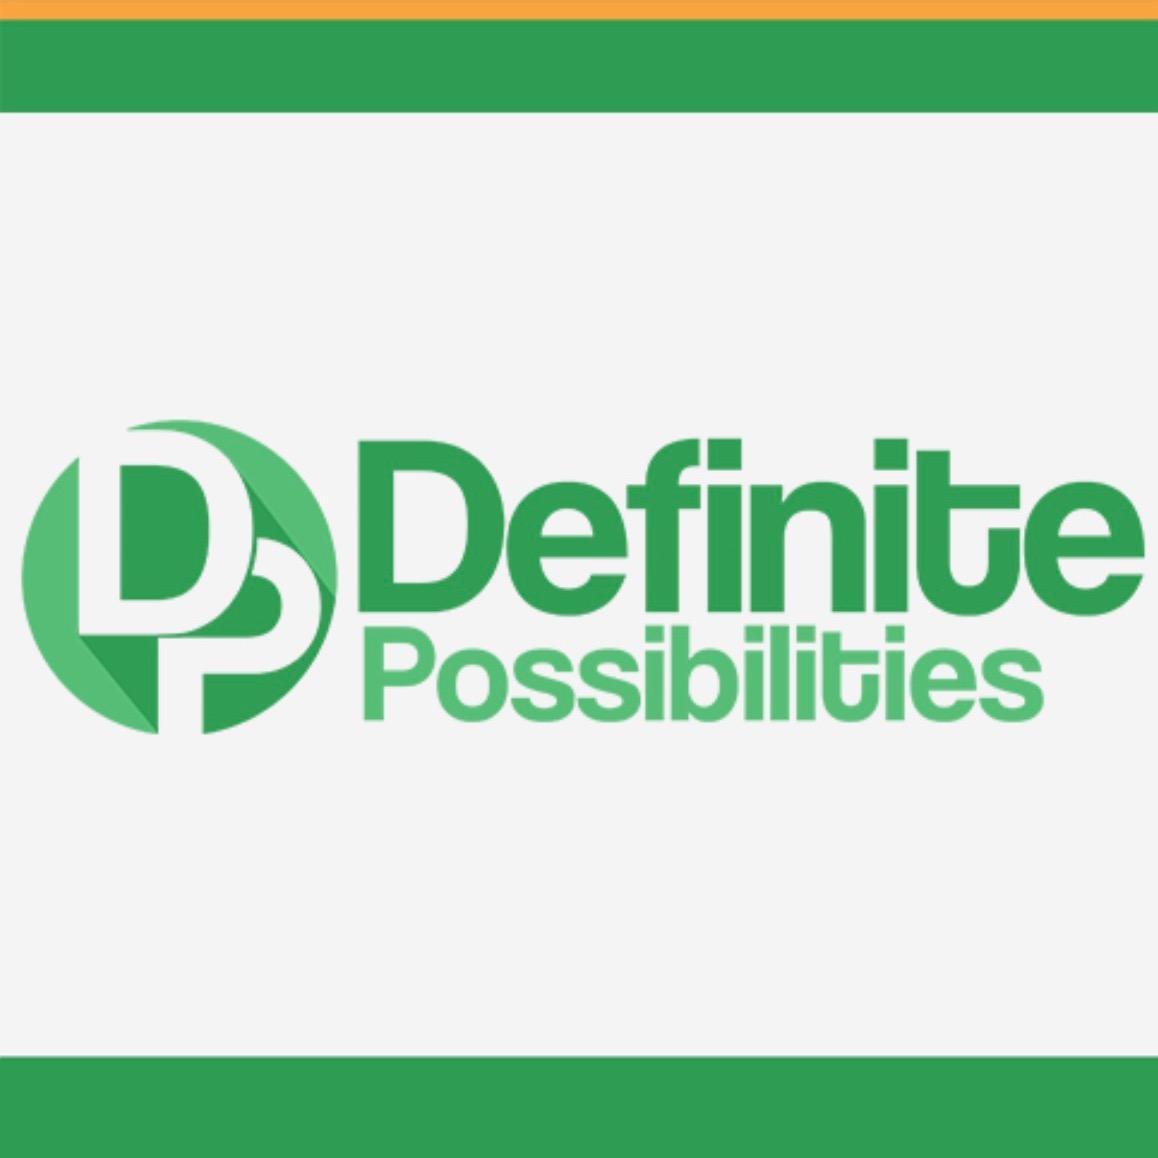 Internet Marketing Service in AZ Tucson 85745 Definite Possibilities 41 South Shannon Road Suite 16102 (818)716-9300